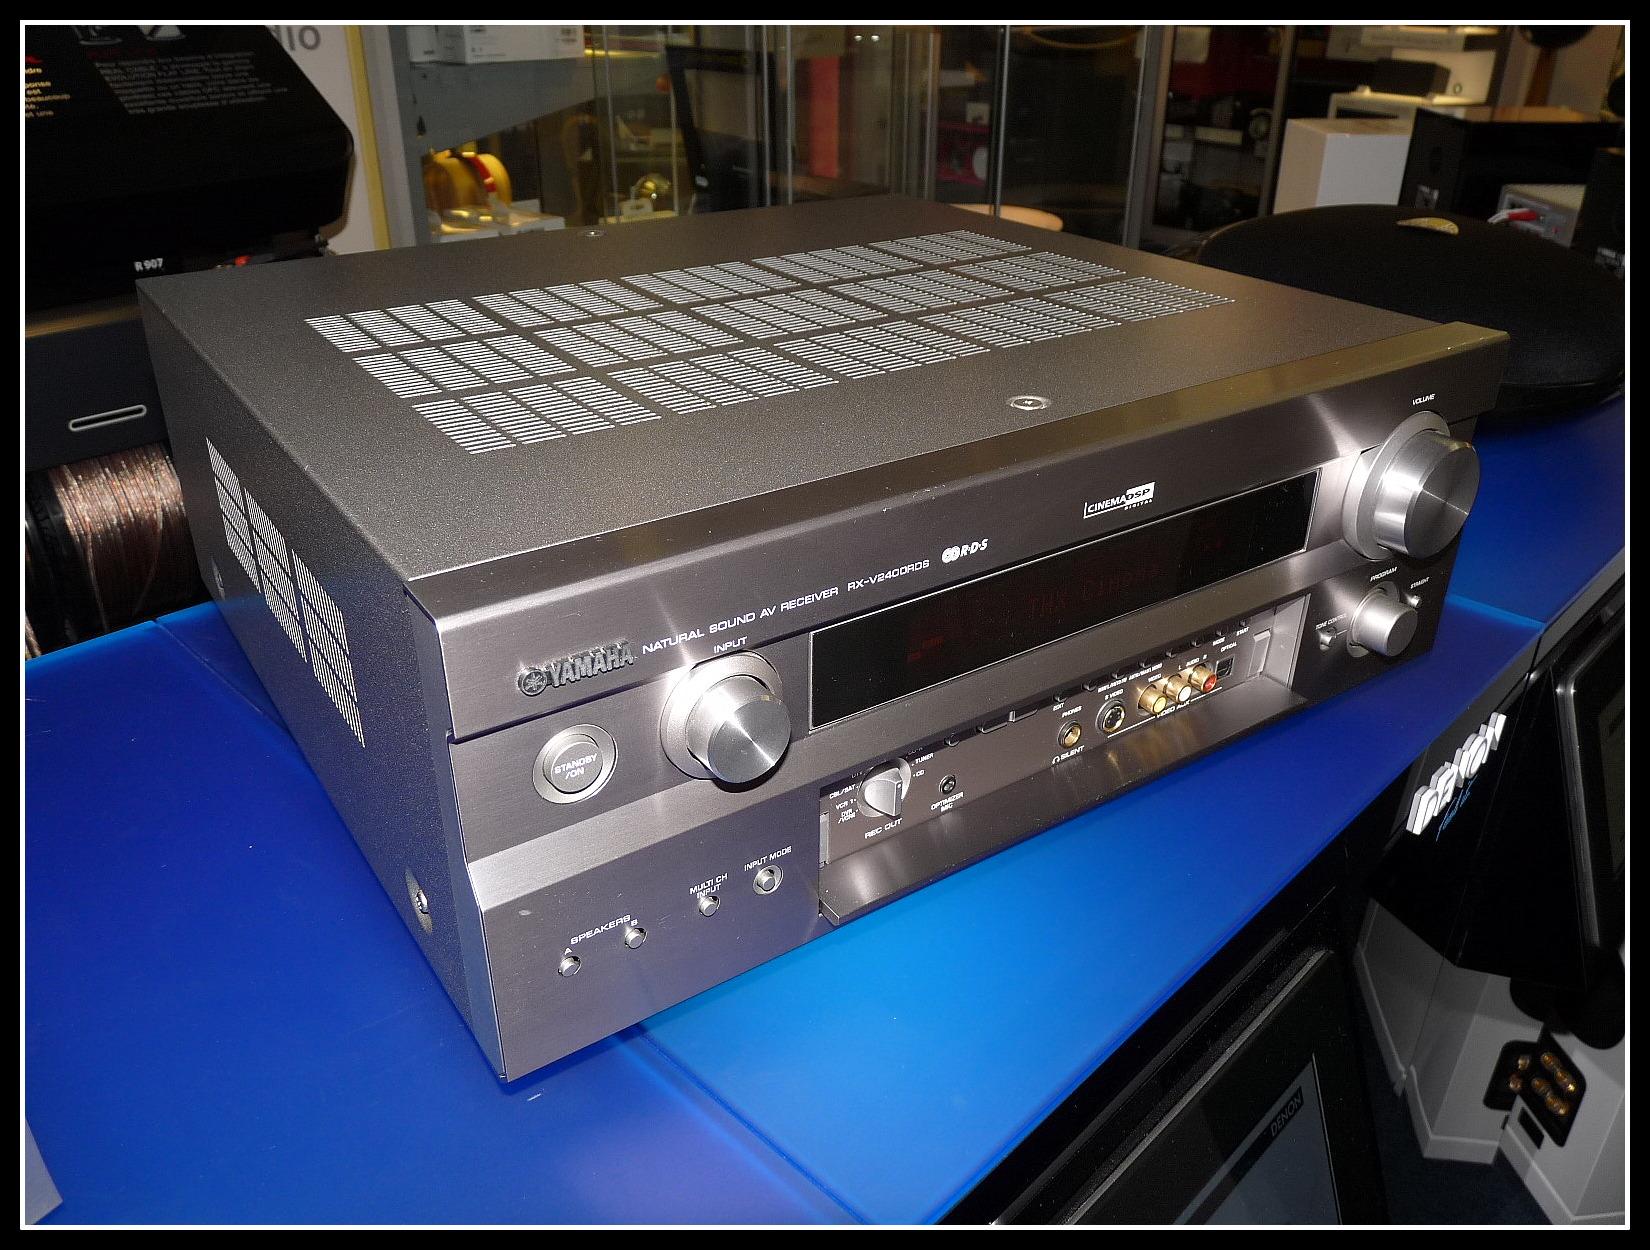 yamaha rx v2400 rds image 815330 audiofanzine rh en audiofanzine com yamaha rx-v2400 manual Yamaha RX- V 1400 vs 2400